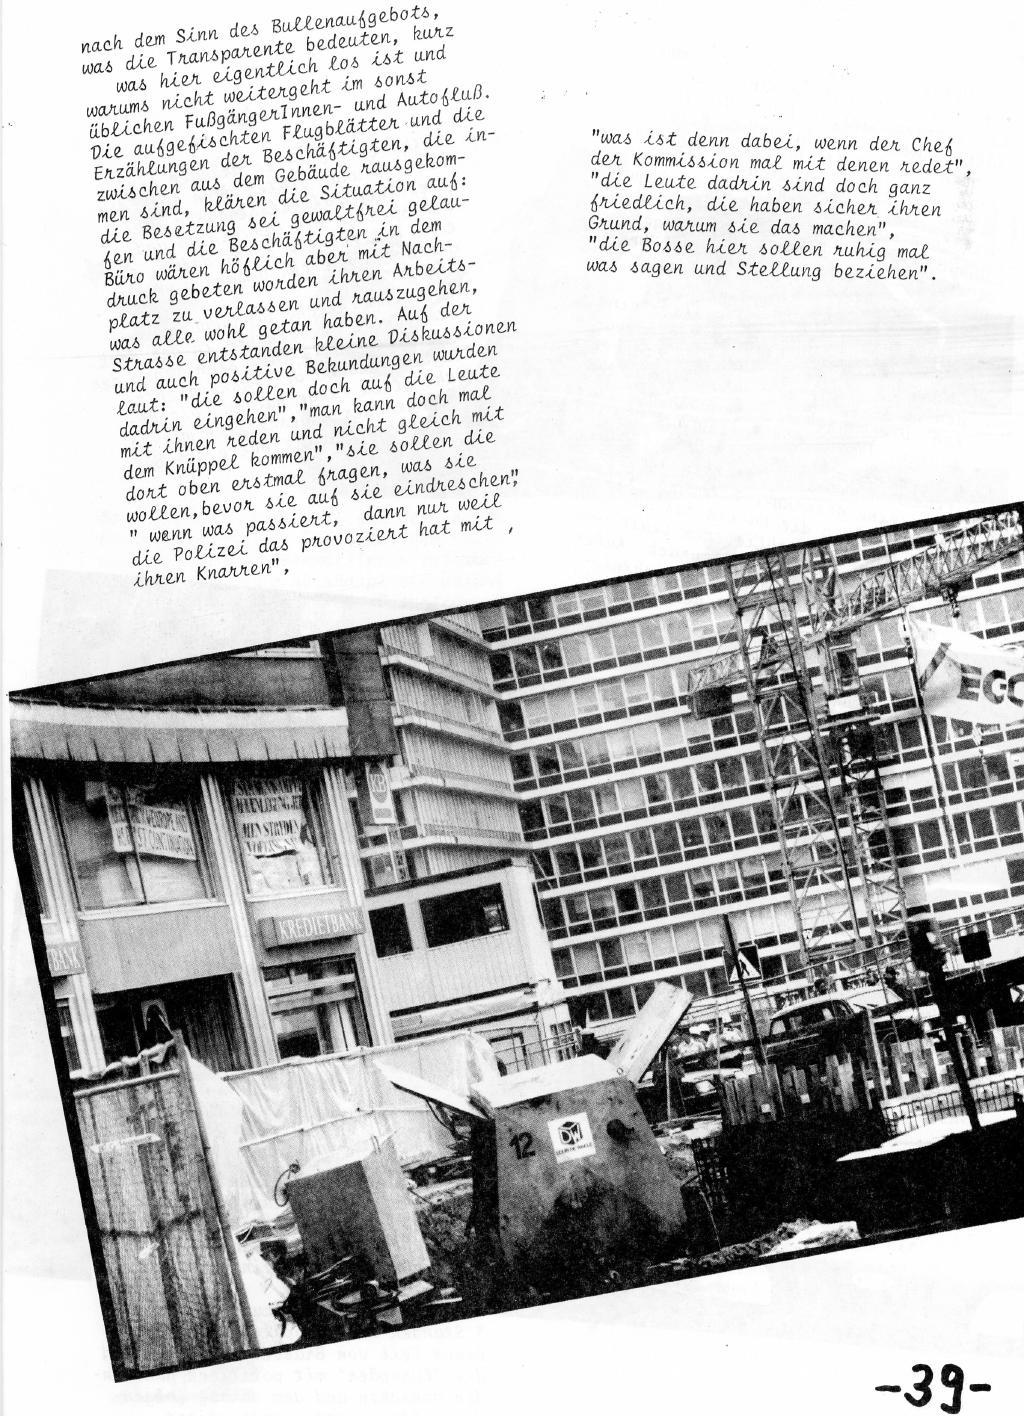 Belgien_Doku_Besetzung_EG_Kommission_1989_041